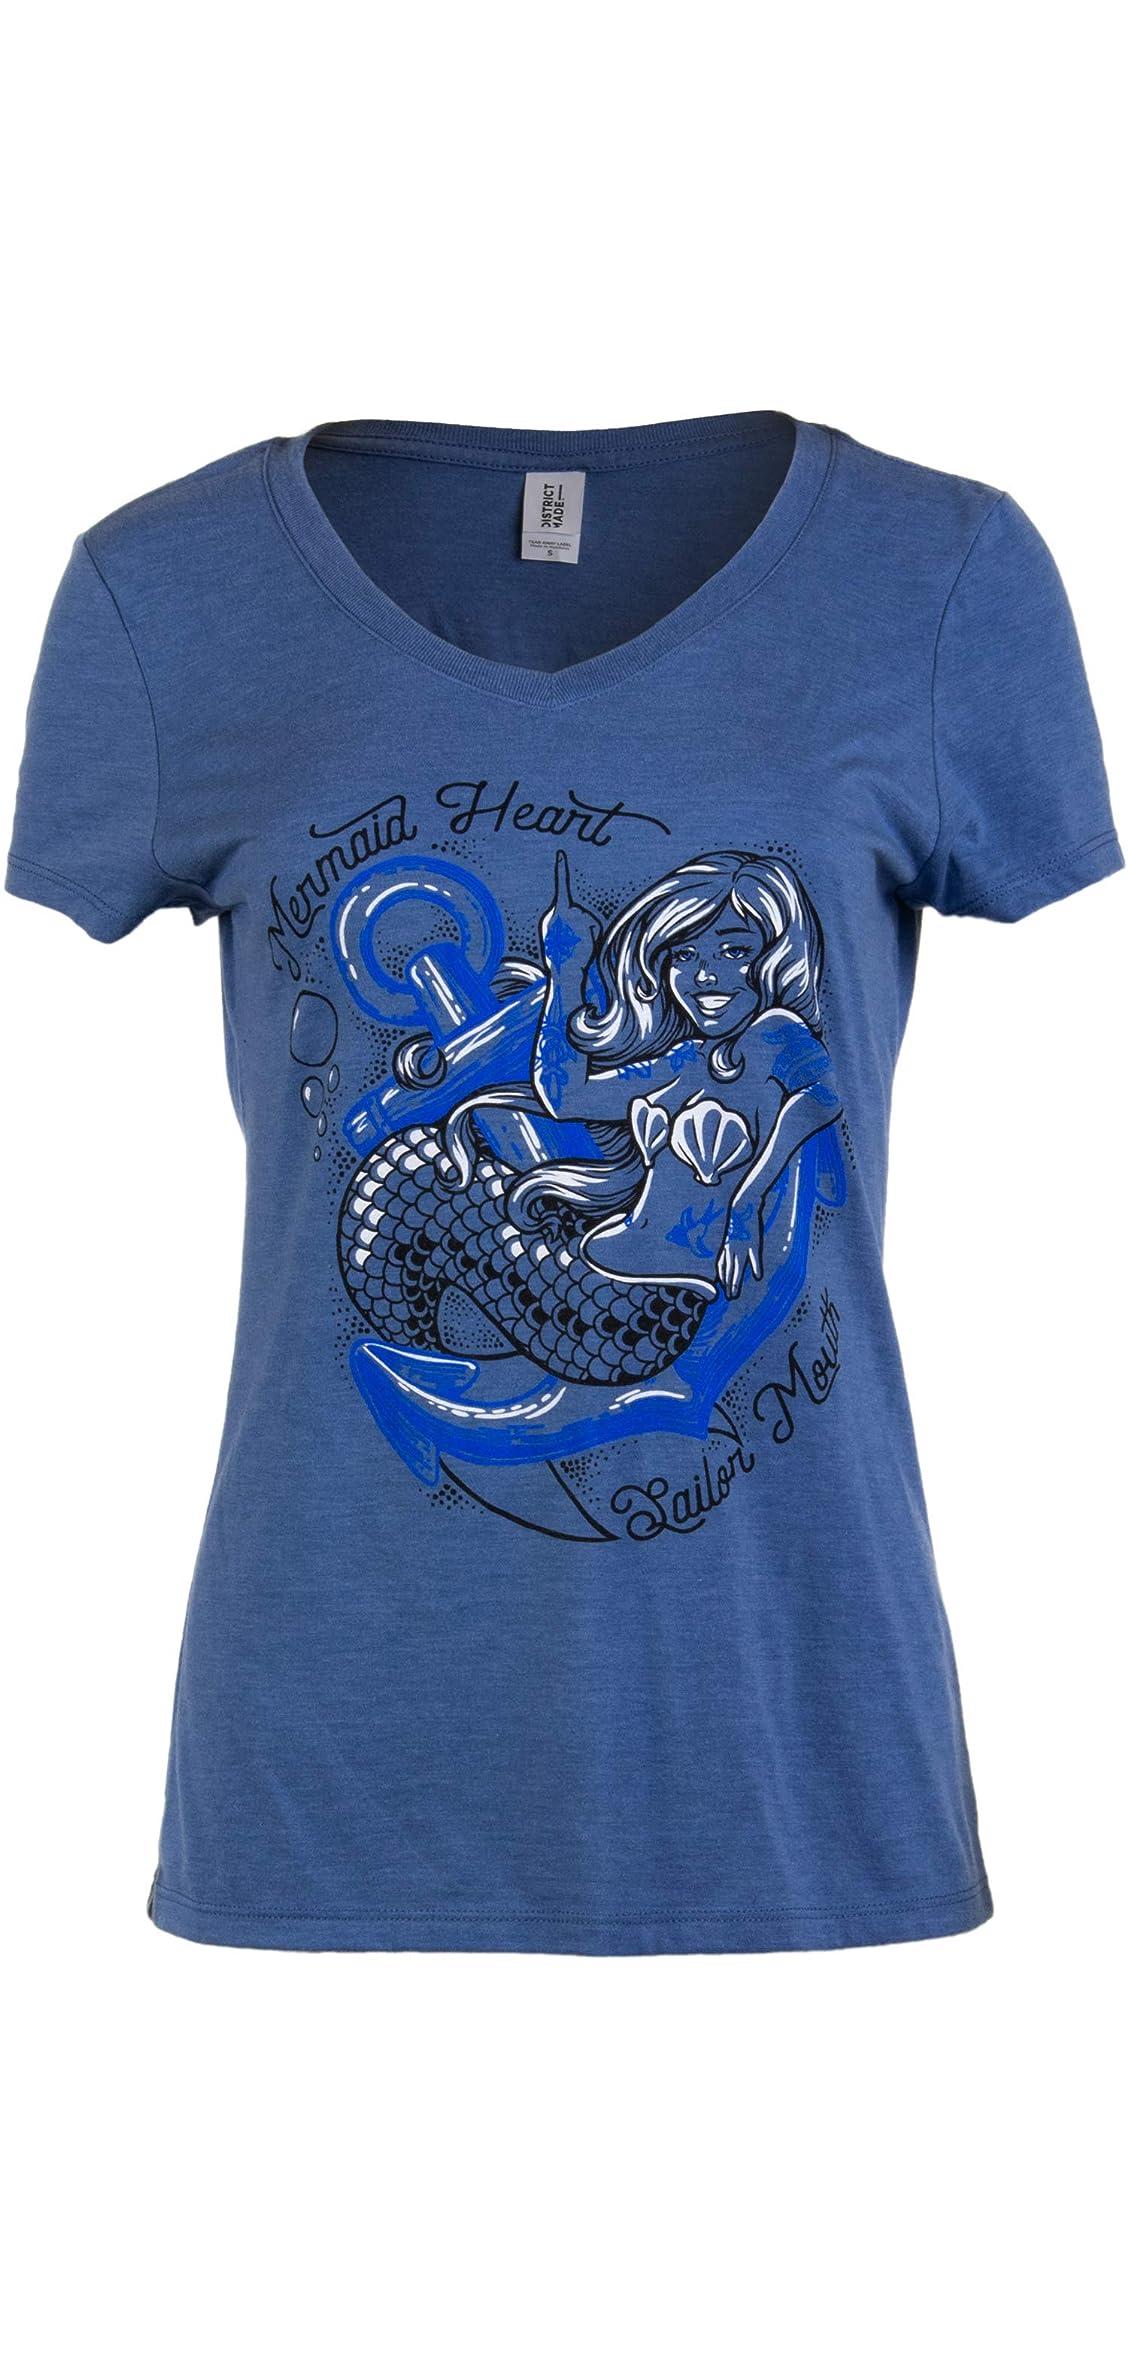 Mermaid Heart, Sailor Mouth  Cute Funny Sassy Sarcastic V-neck